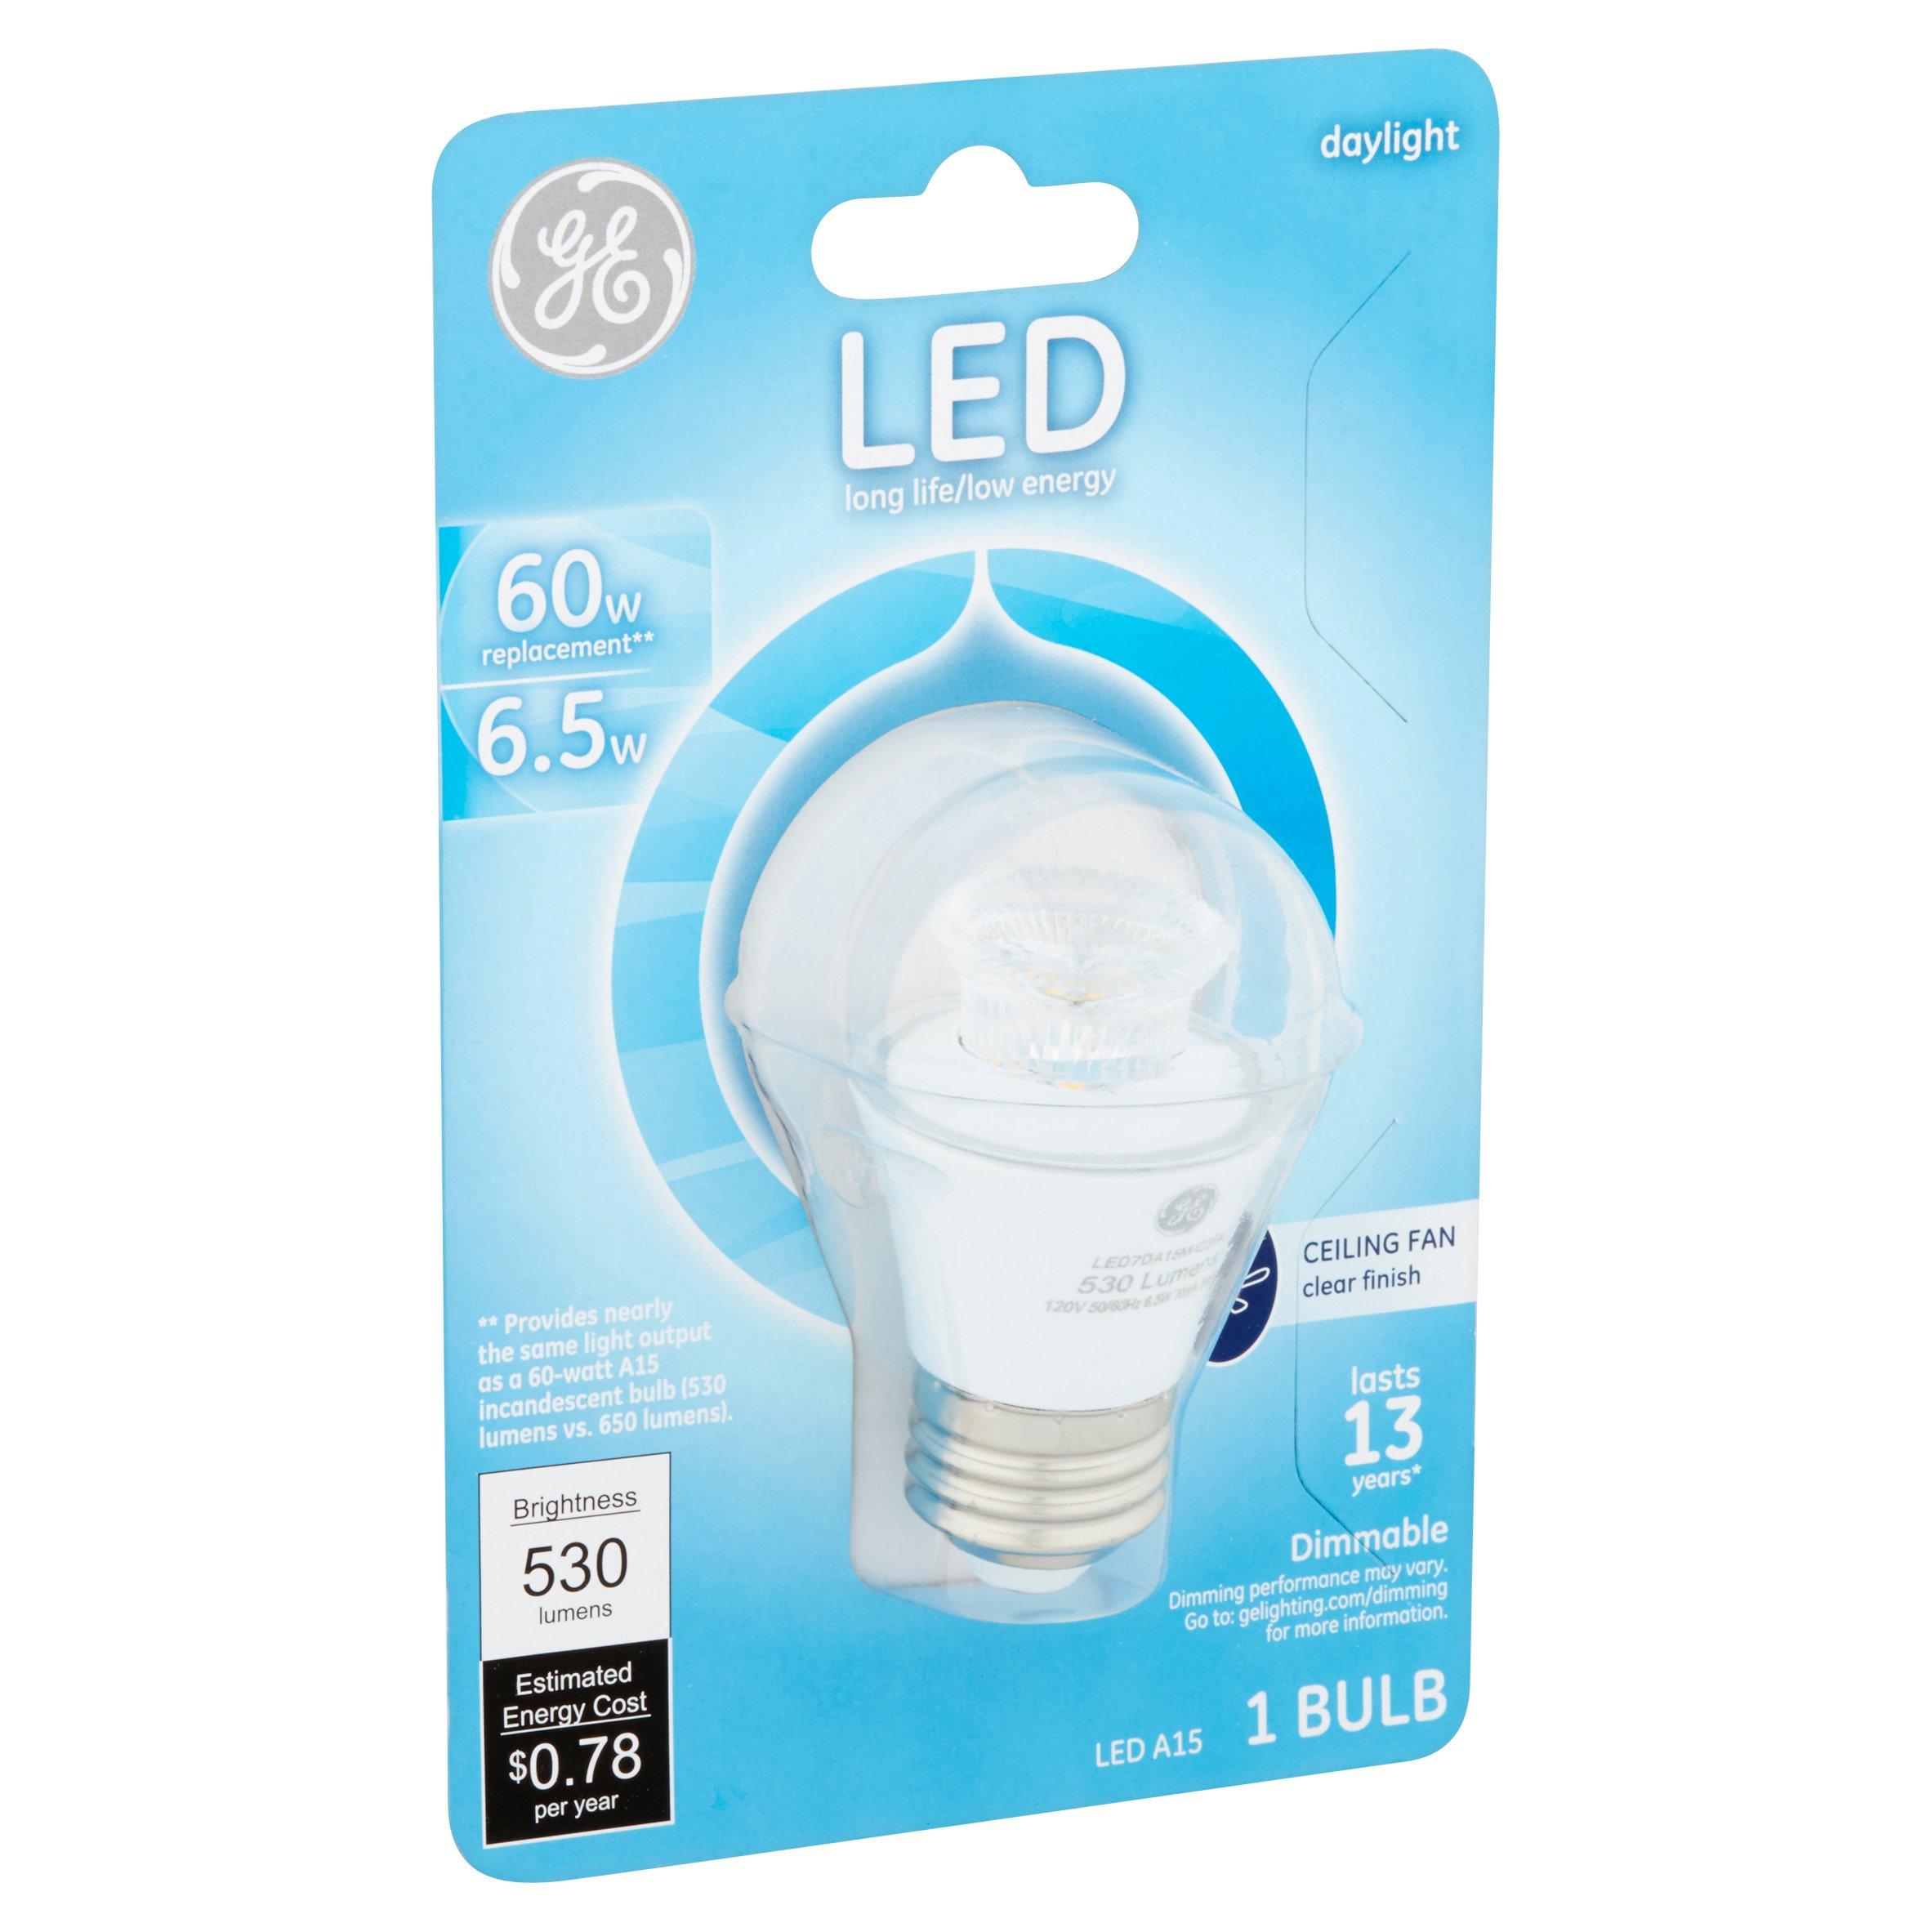 GE LED Daylight A15 Bulb 6 5W Walmart